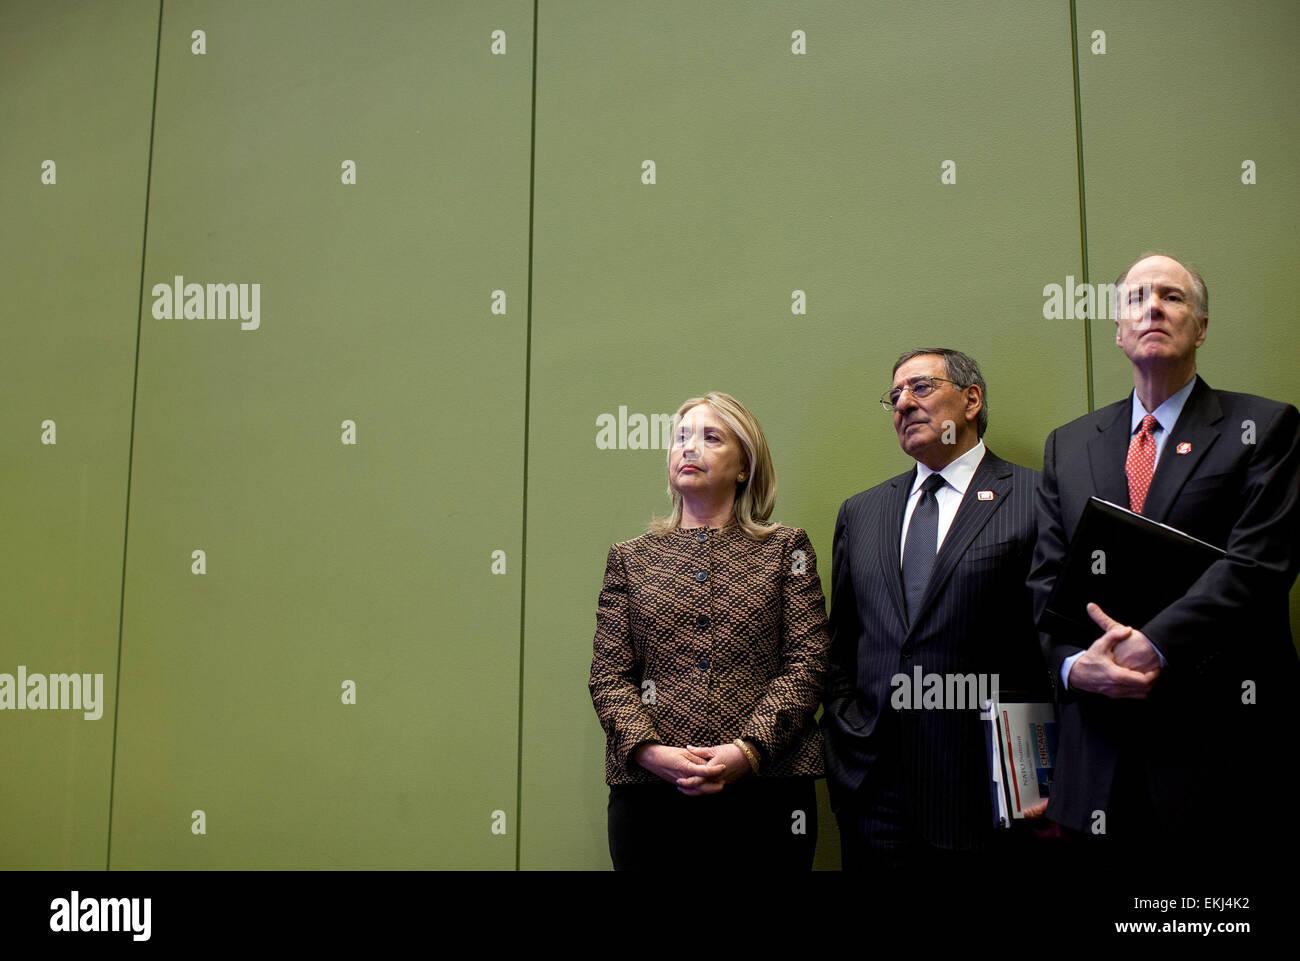 20.MAY.2012. CHICAGO  SECRETARY OF STATE HILLARY RODHAM CLINTON, DEFENSE SECRETARY LEON PANETTA, AND NATIONAL SECURITY - Stock Image